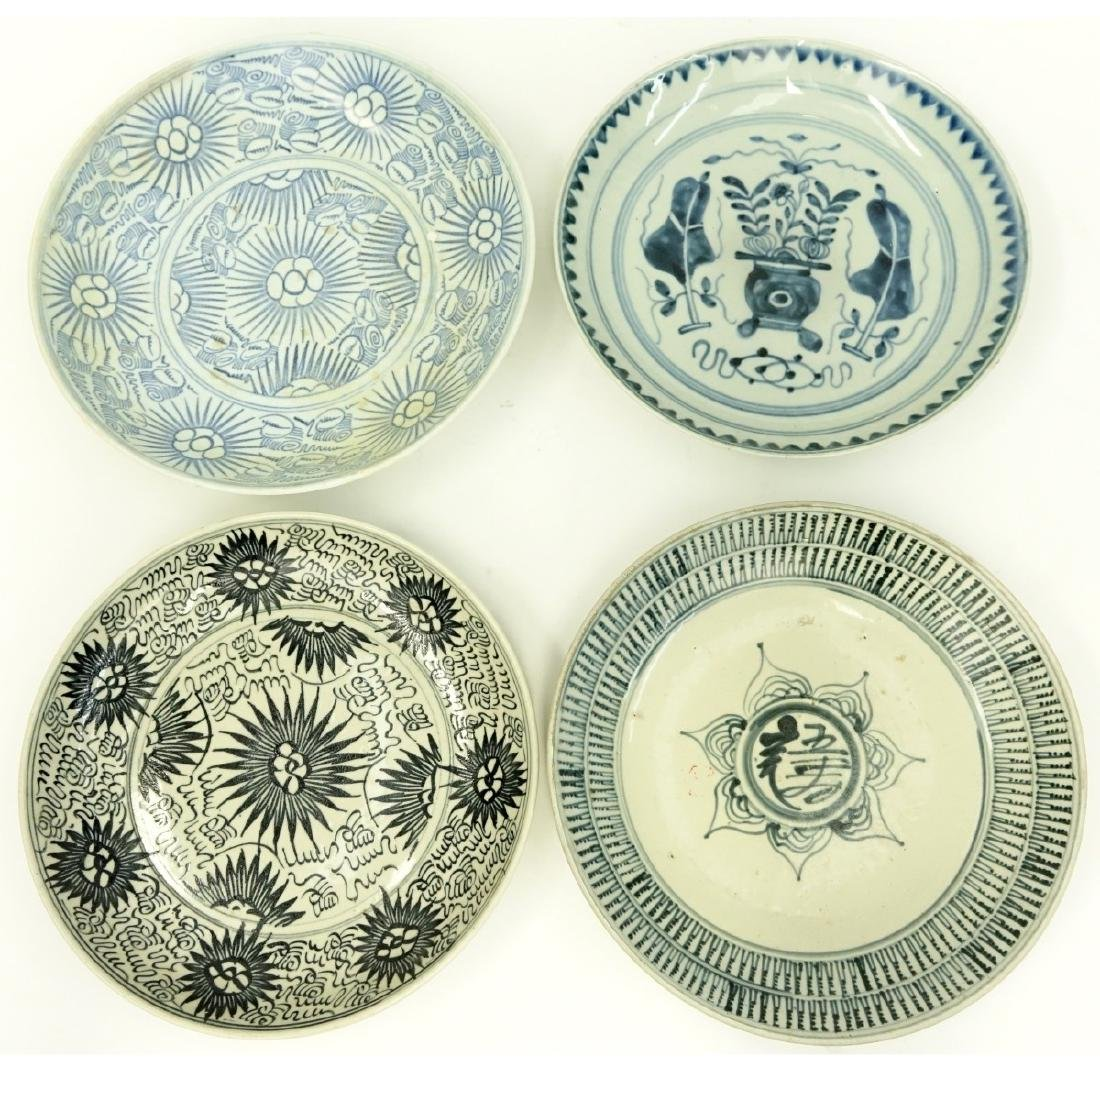 4 Antique Chinese Blue & White Ceramic Bowls